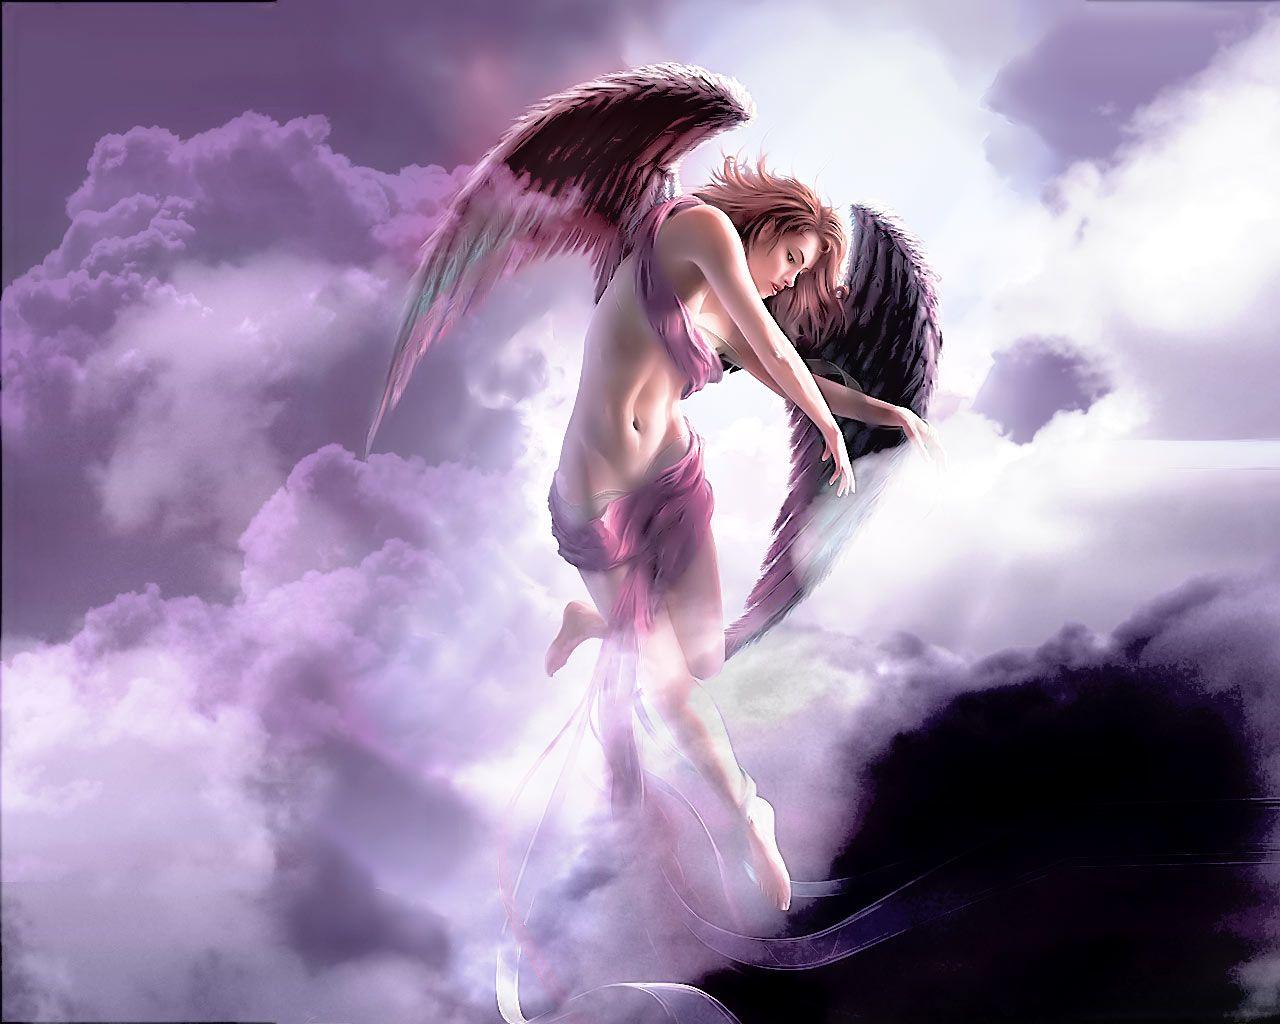 Beautiful Pink Angel Hd Wallpaper For Desktop Imagefully Com Engel Aartsengel Feeen